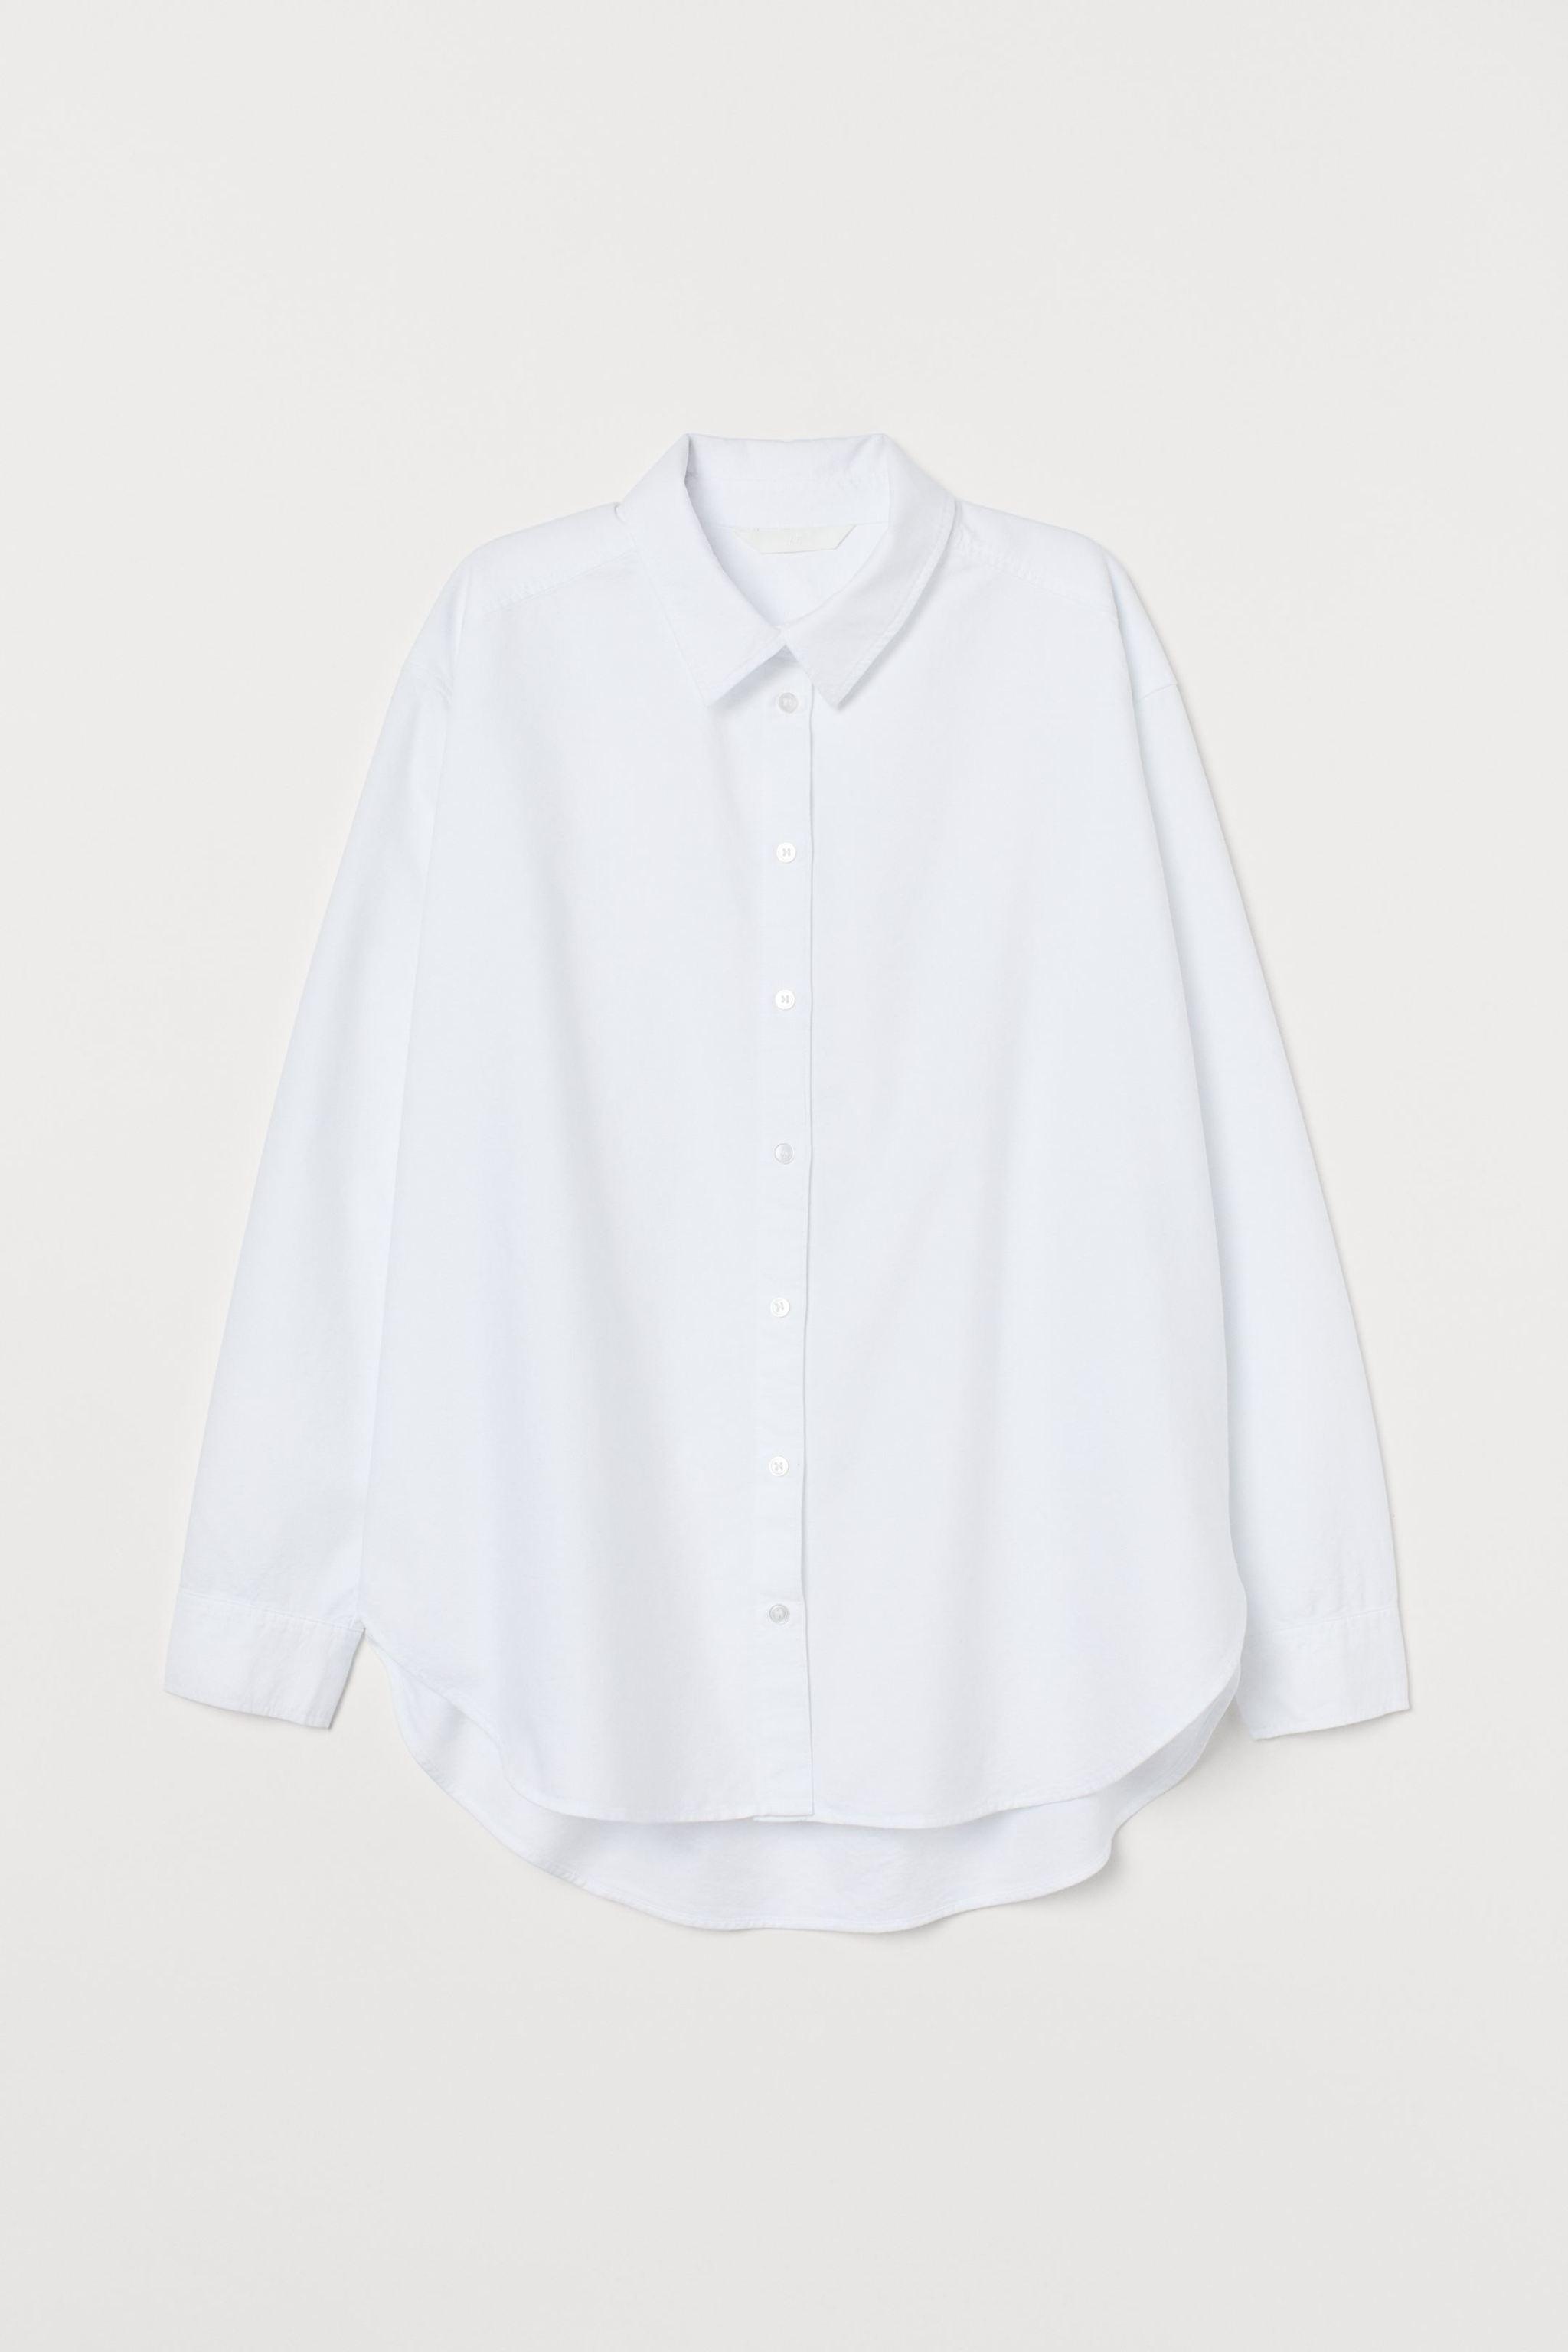 Camisa blanca de H&M (19,99 euros).